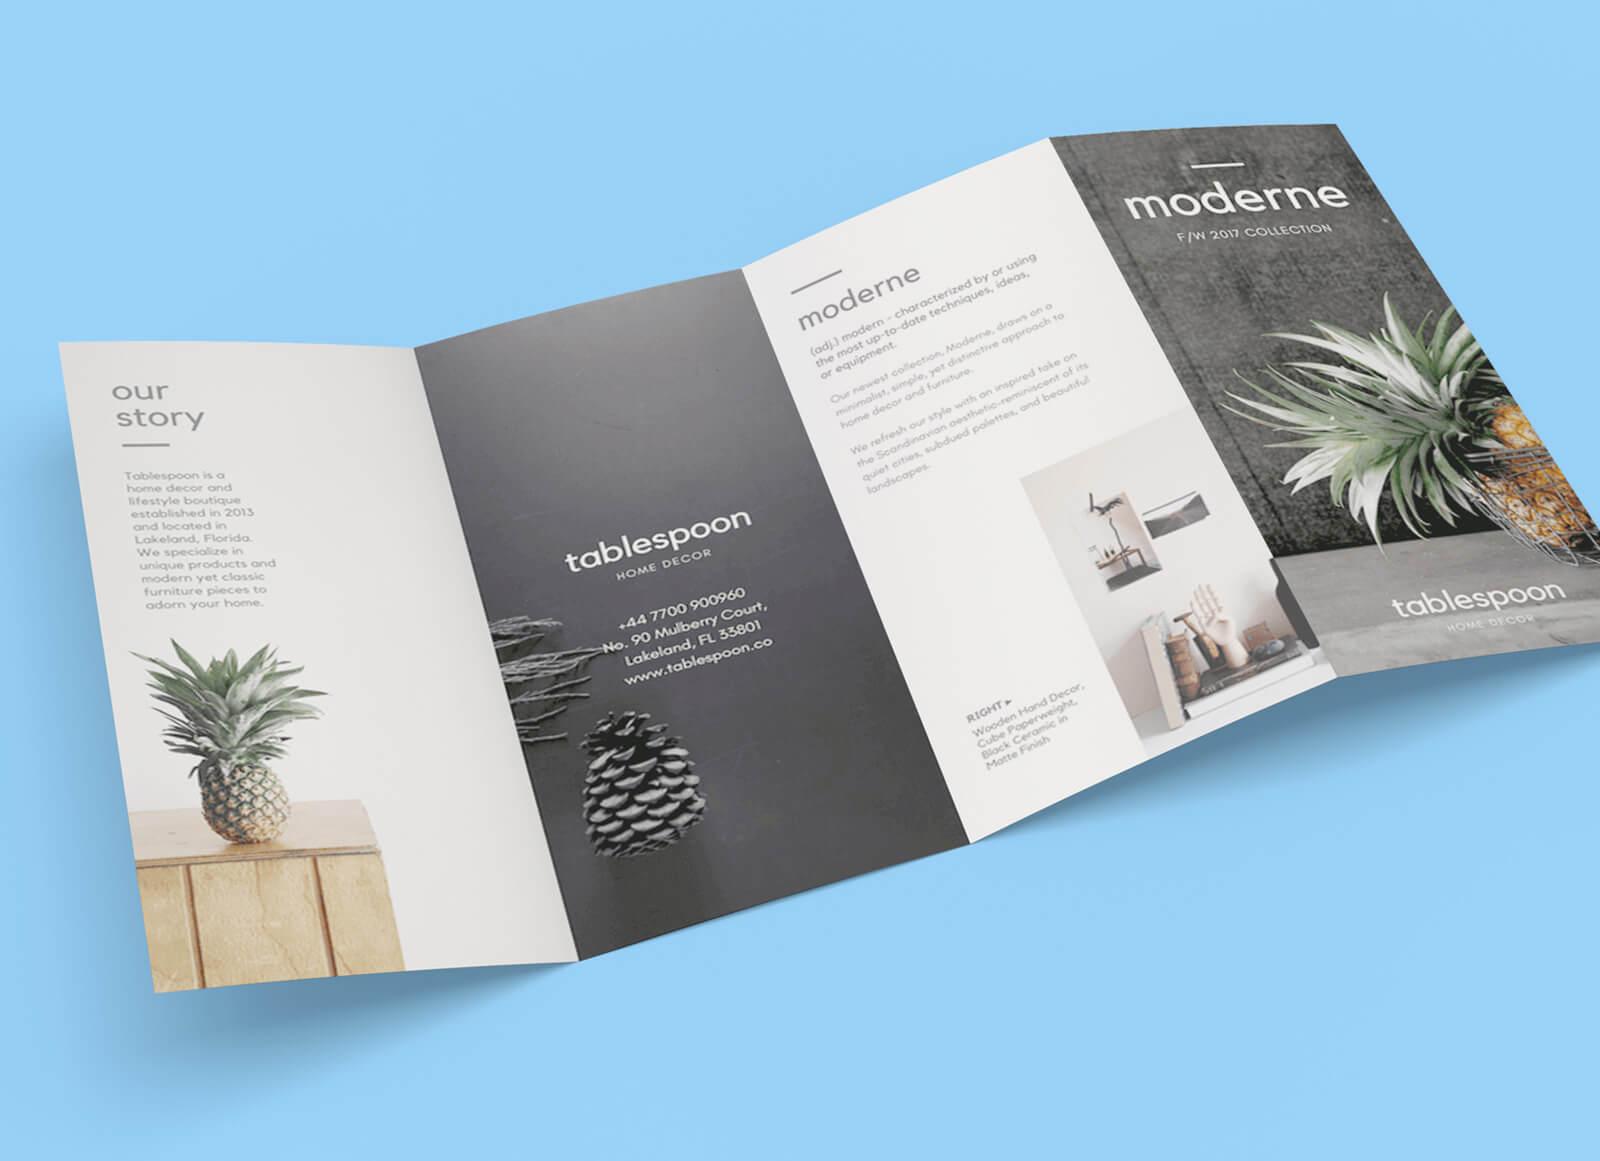 Free 4 Panel Quad Fold Brochure Mockup Psd - Good Mockups Pertaining To Quad Fold Brochure Template